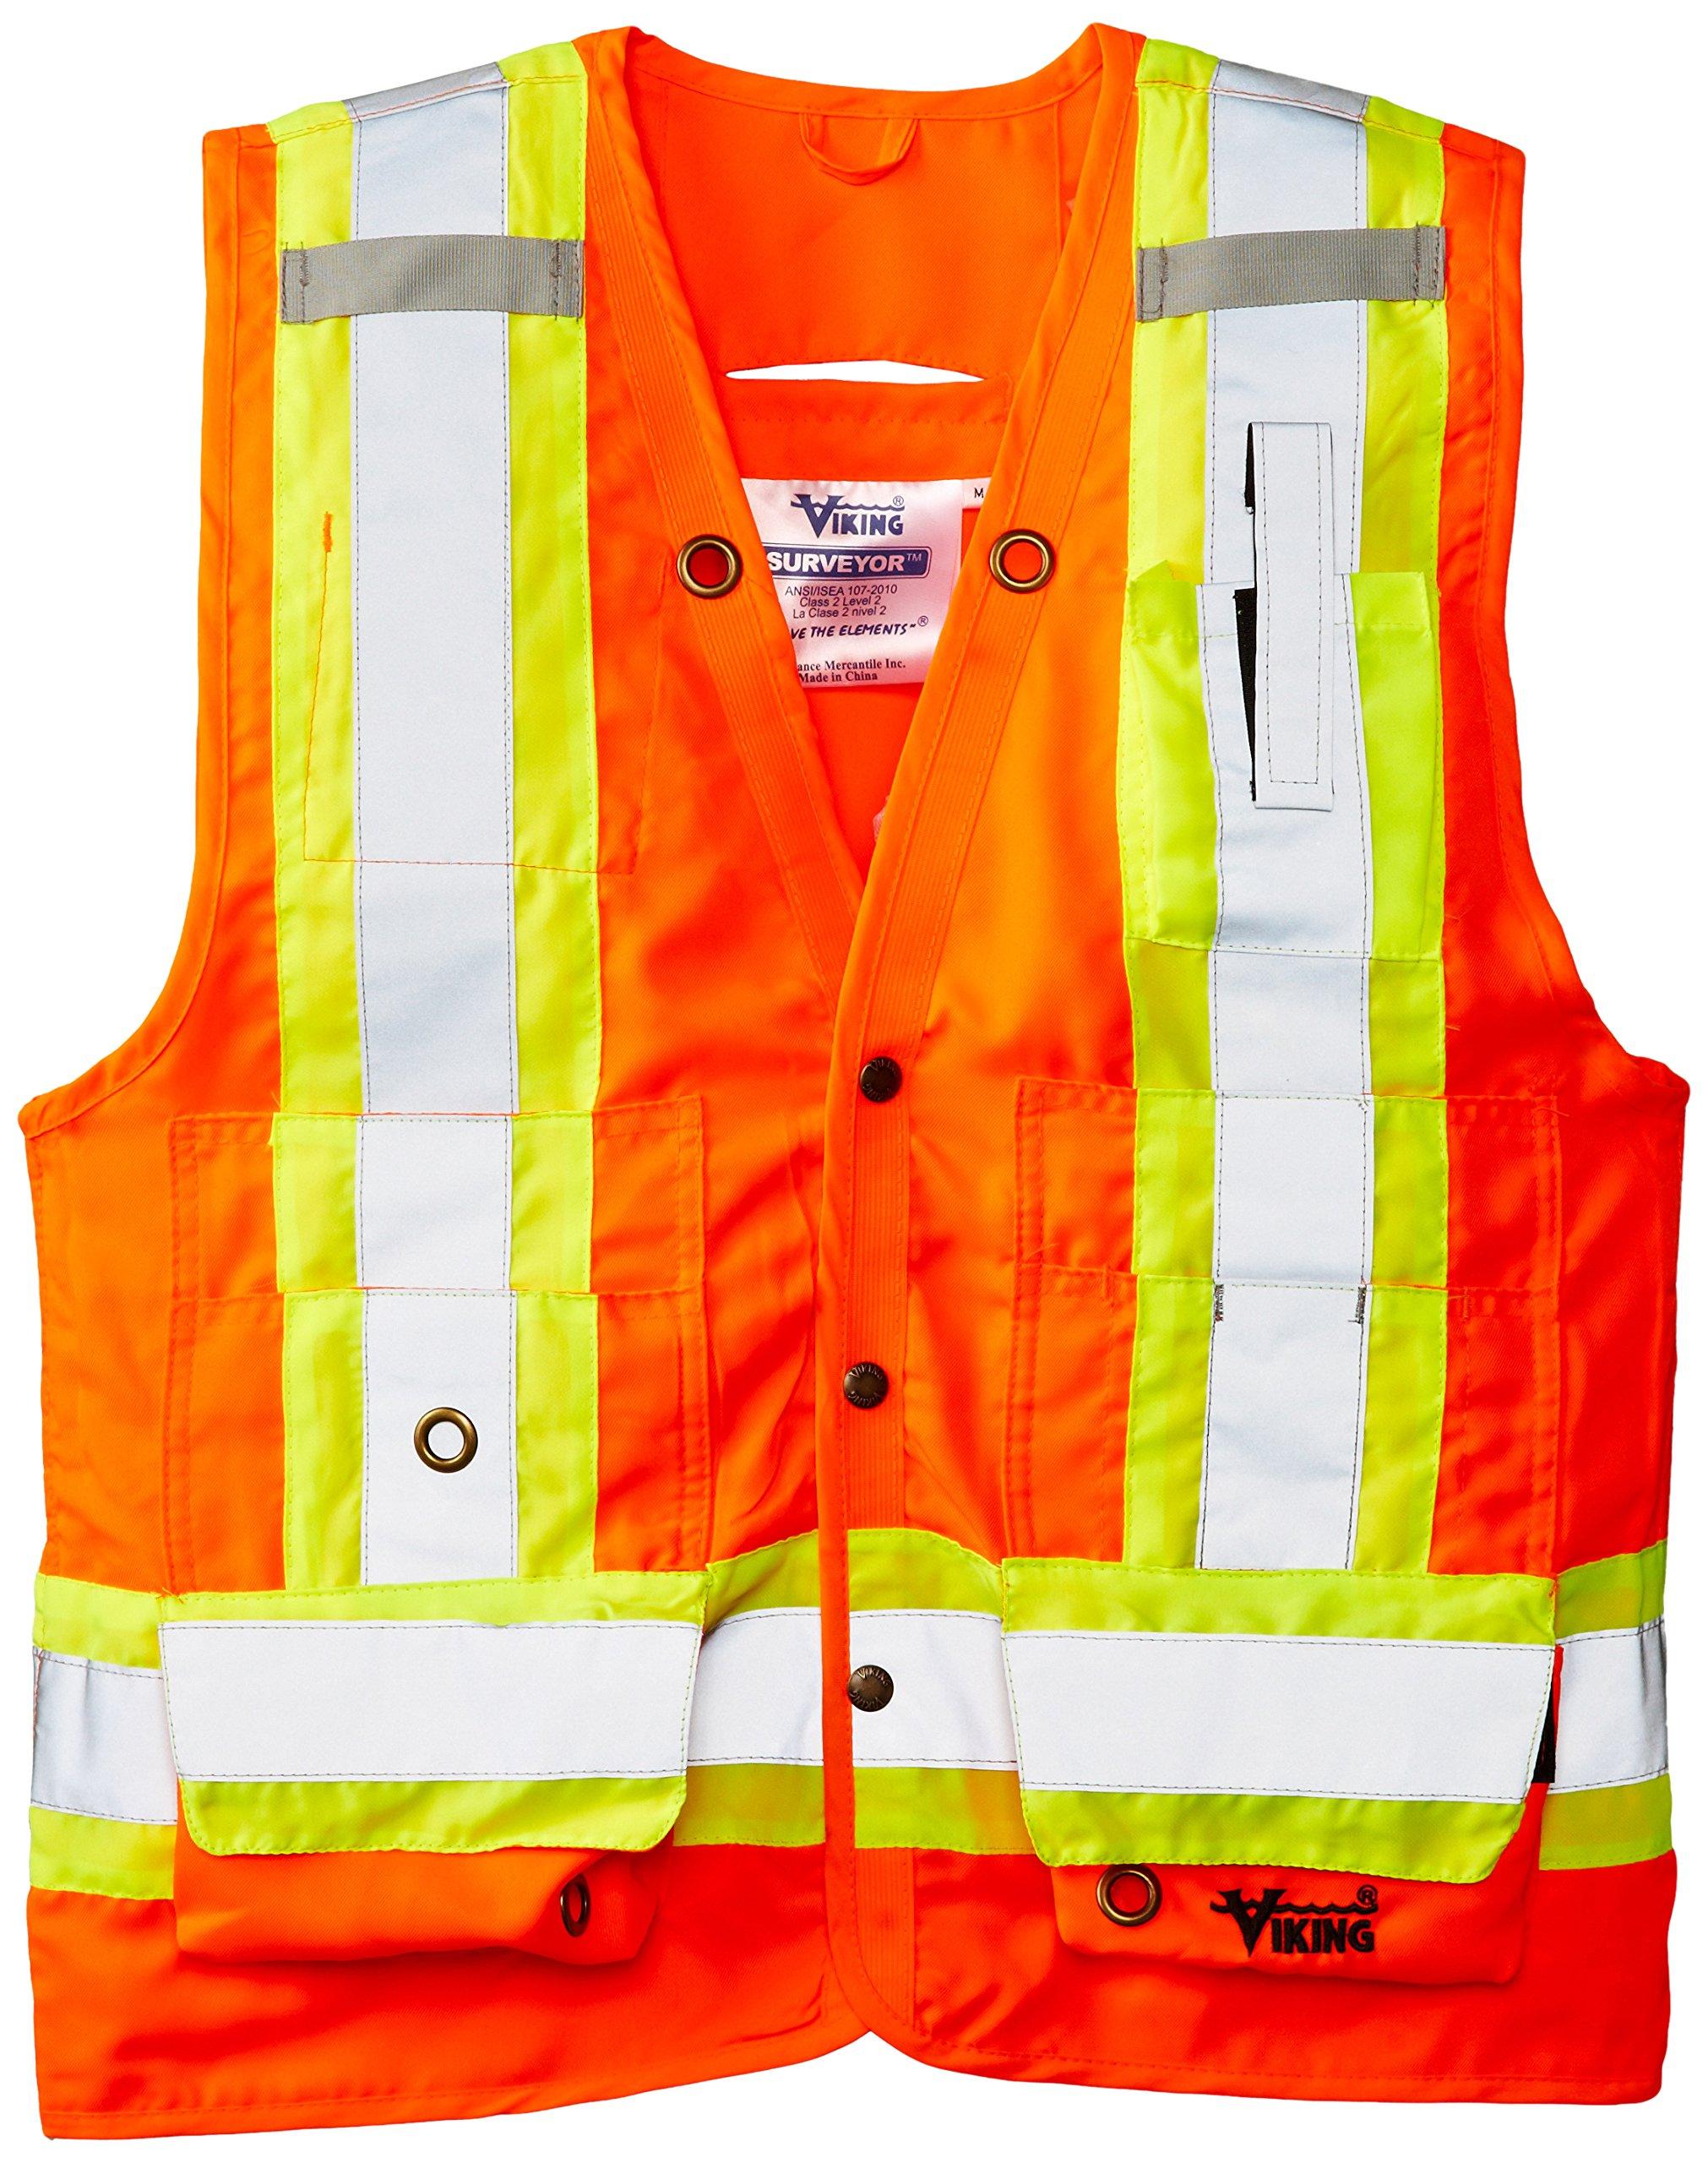 Viking Surveyor Hi-Vis Safety Vest, Orange, 3X-Large by Viking (Image #1)